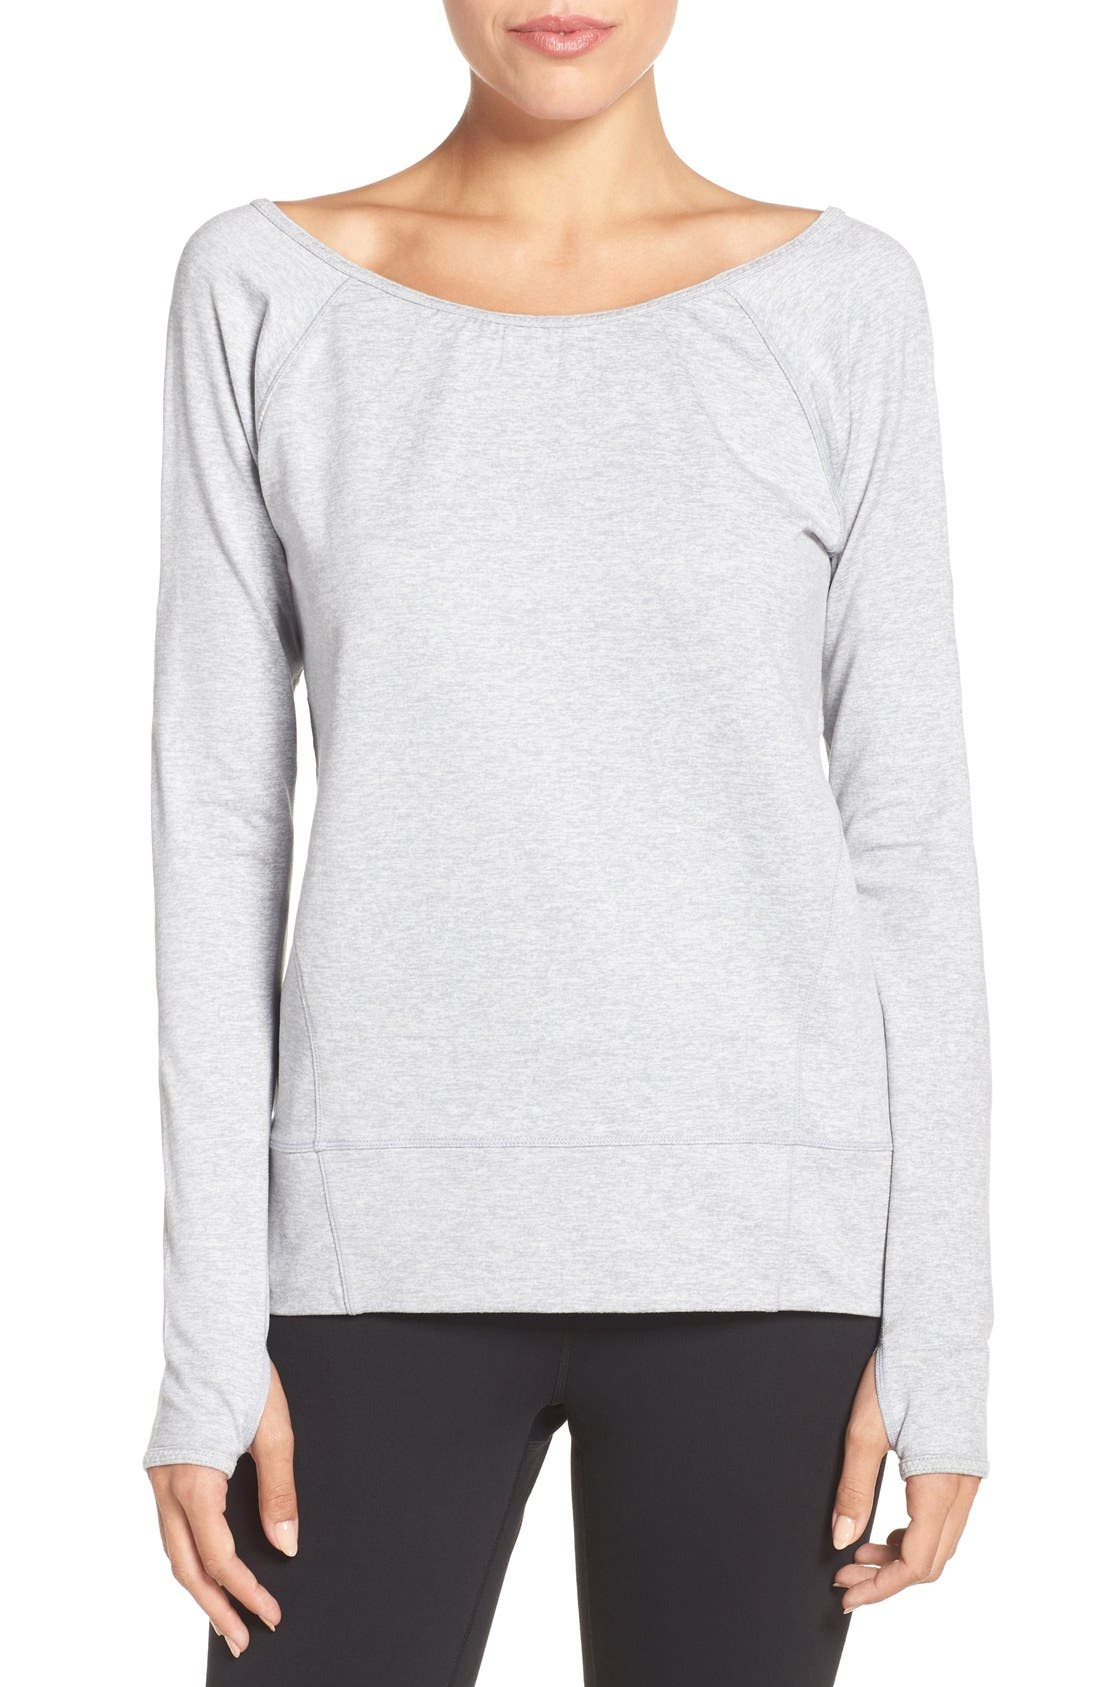 Main Image - Zella Etoile Pullover Sweatshirt